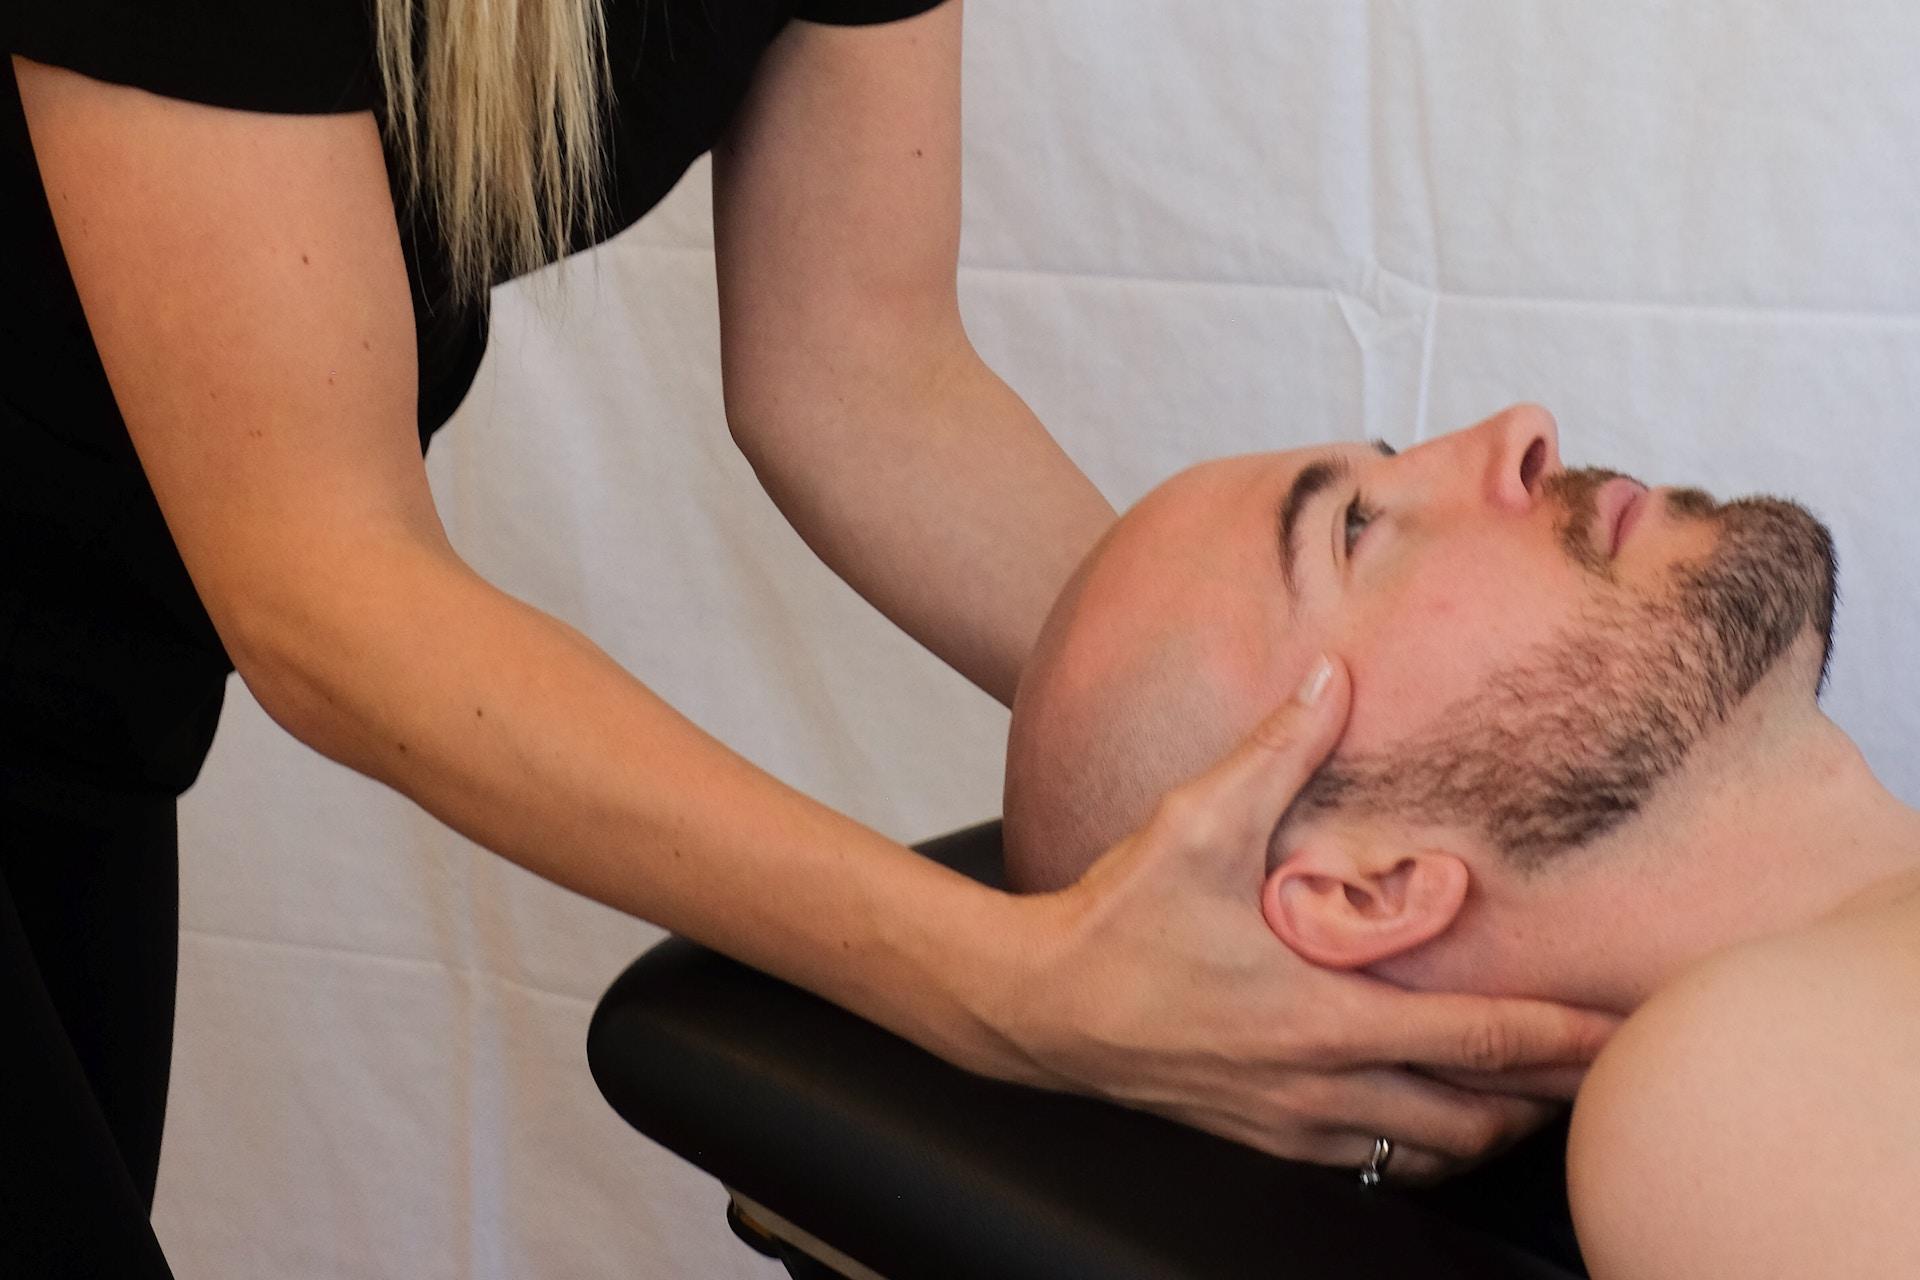 Manual neck adjustment